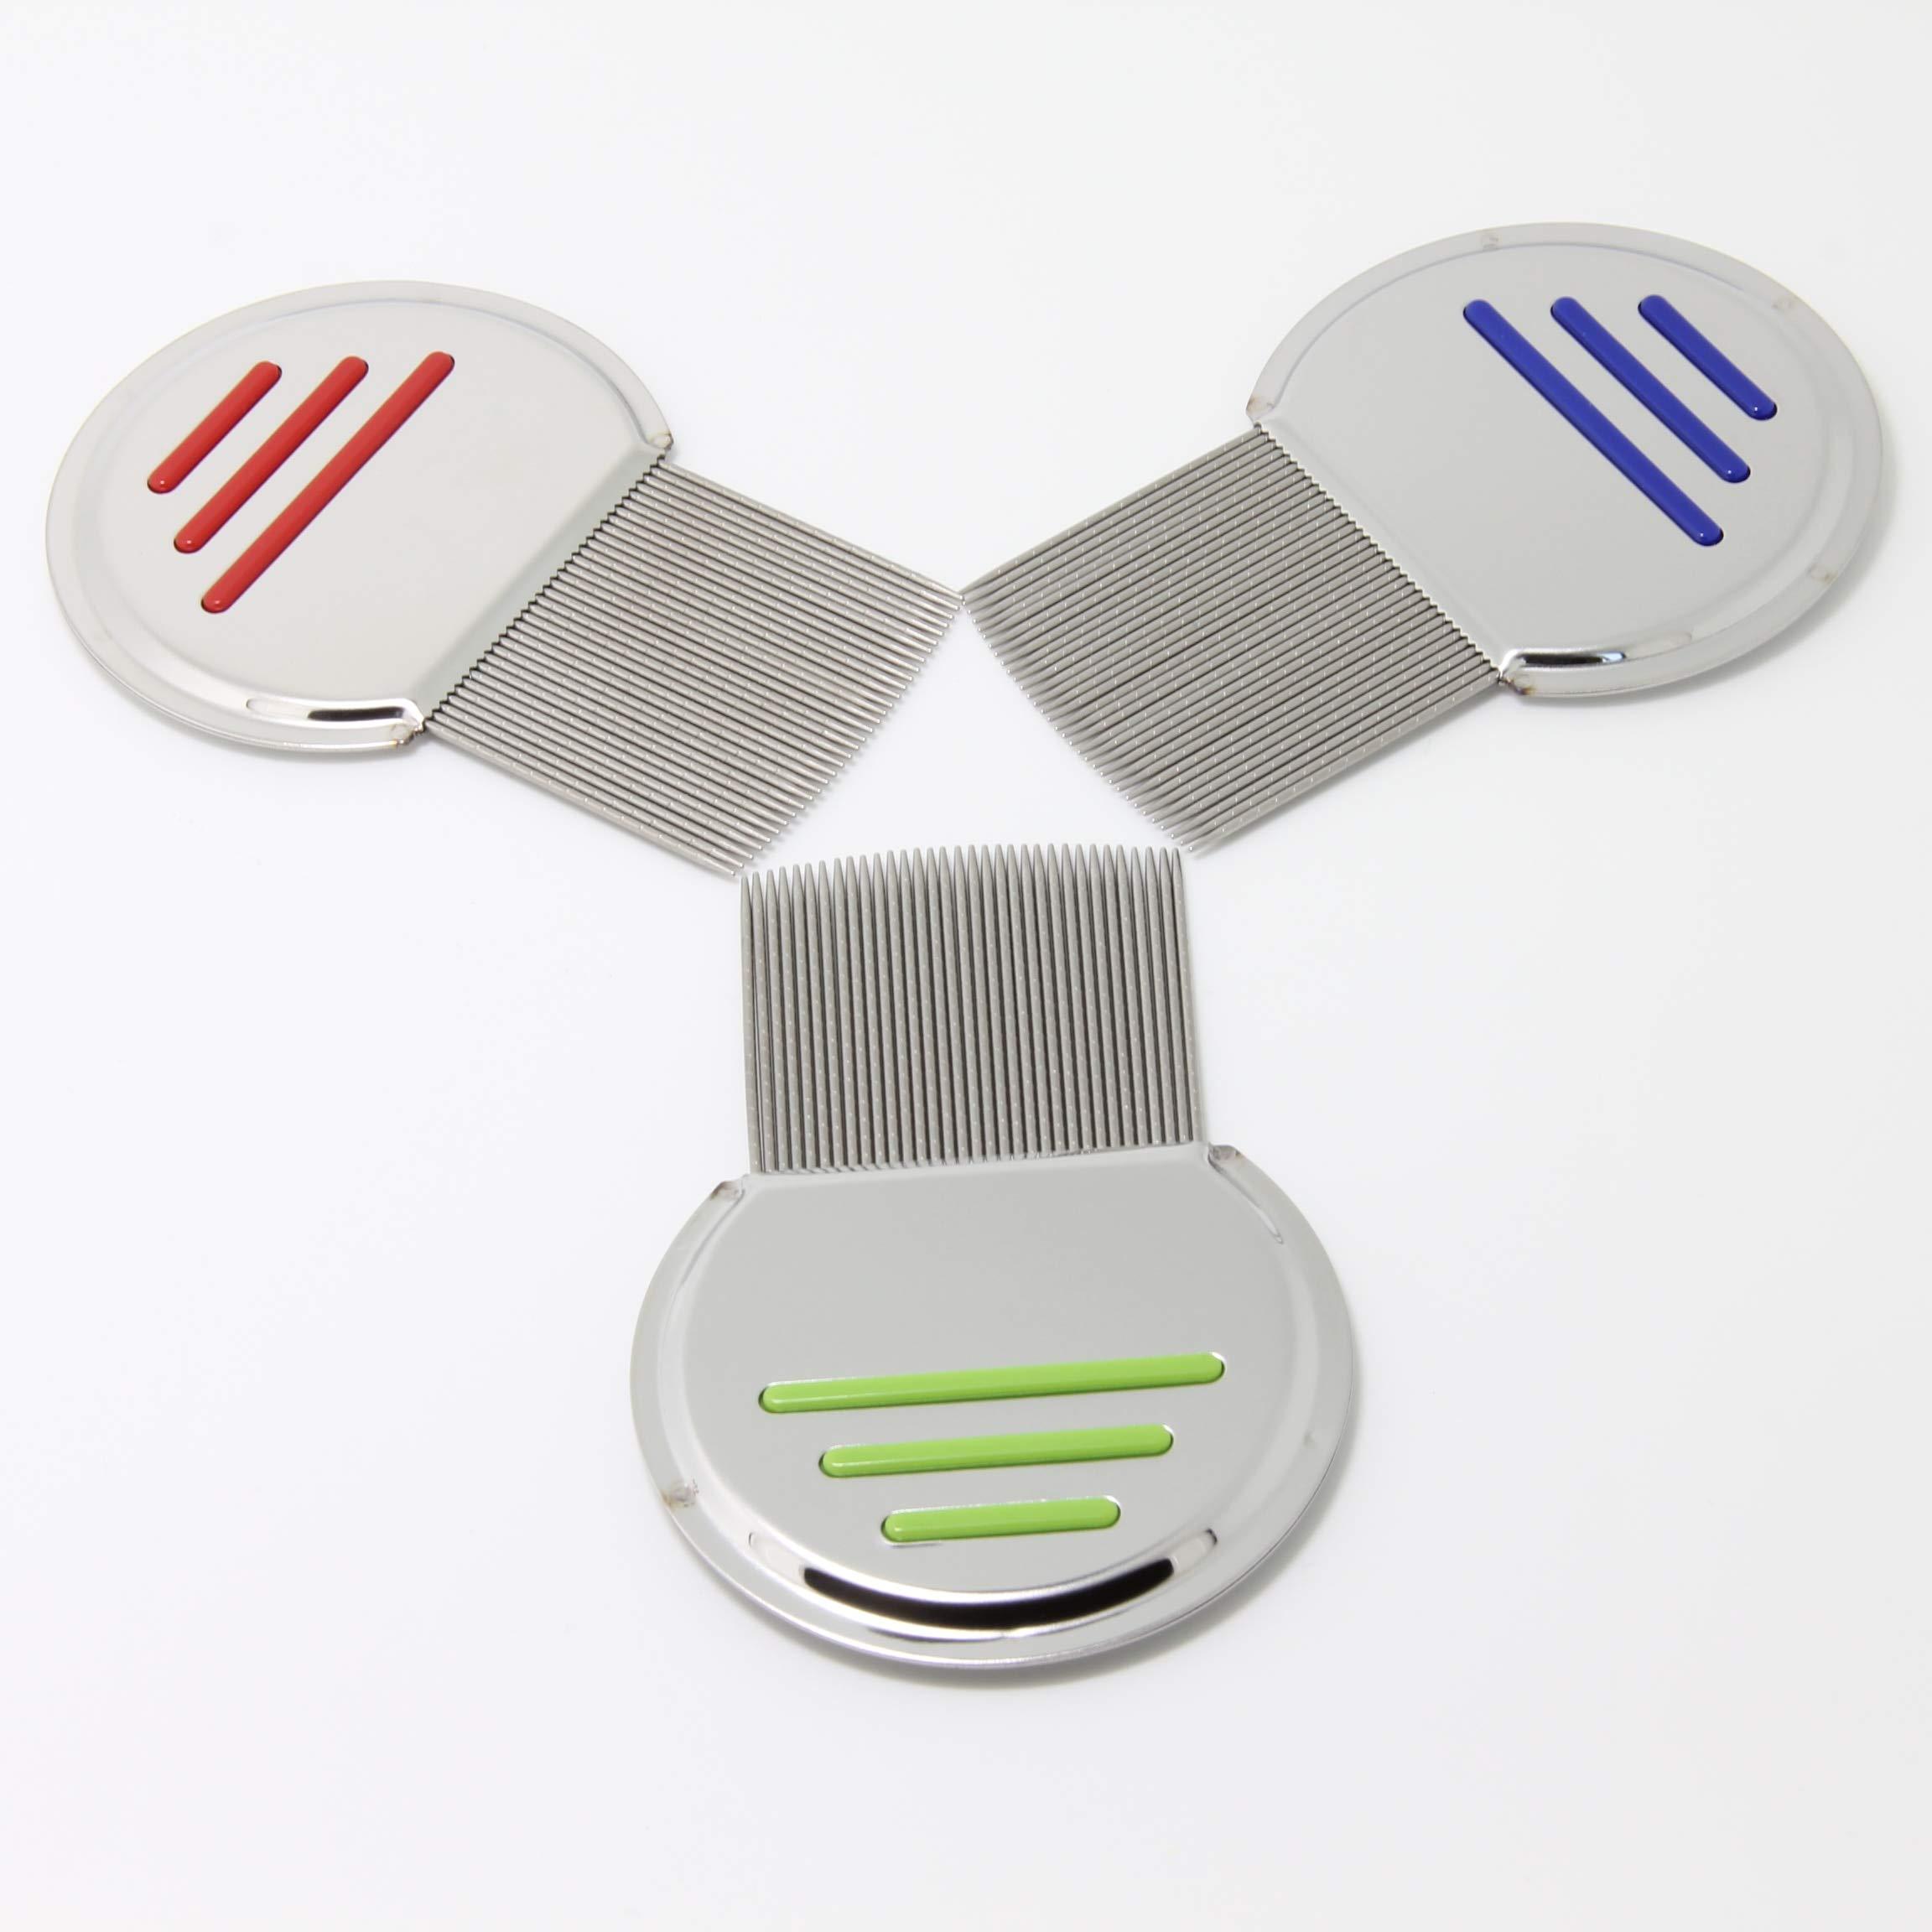 Goonpetchkrai.rapat7498 Lice Combs Set Lice Stainless Steel Metal Teeth by Goonpetchkrai.rapat7498